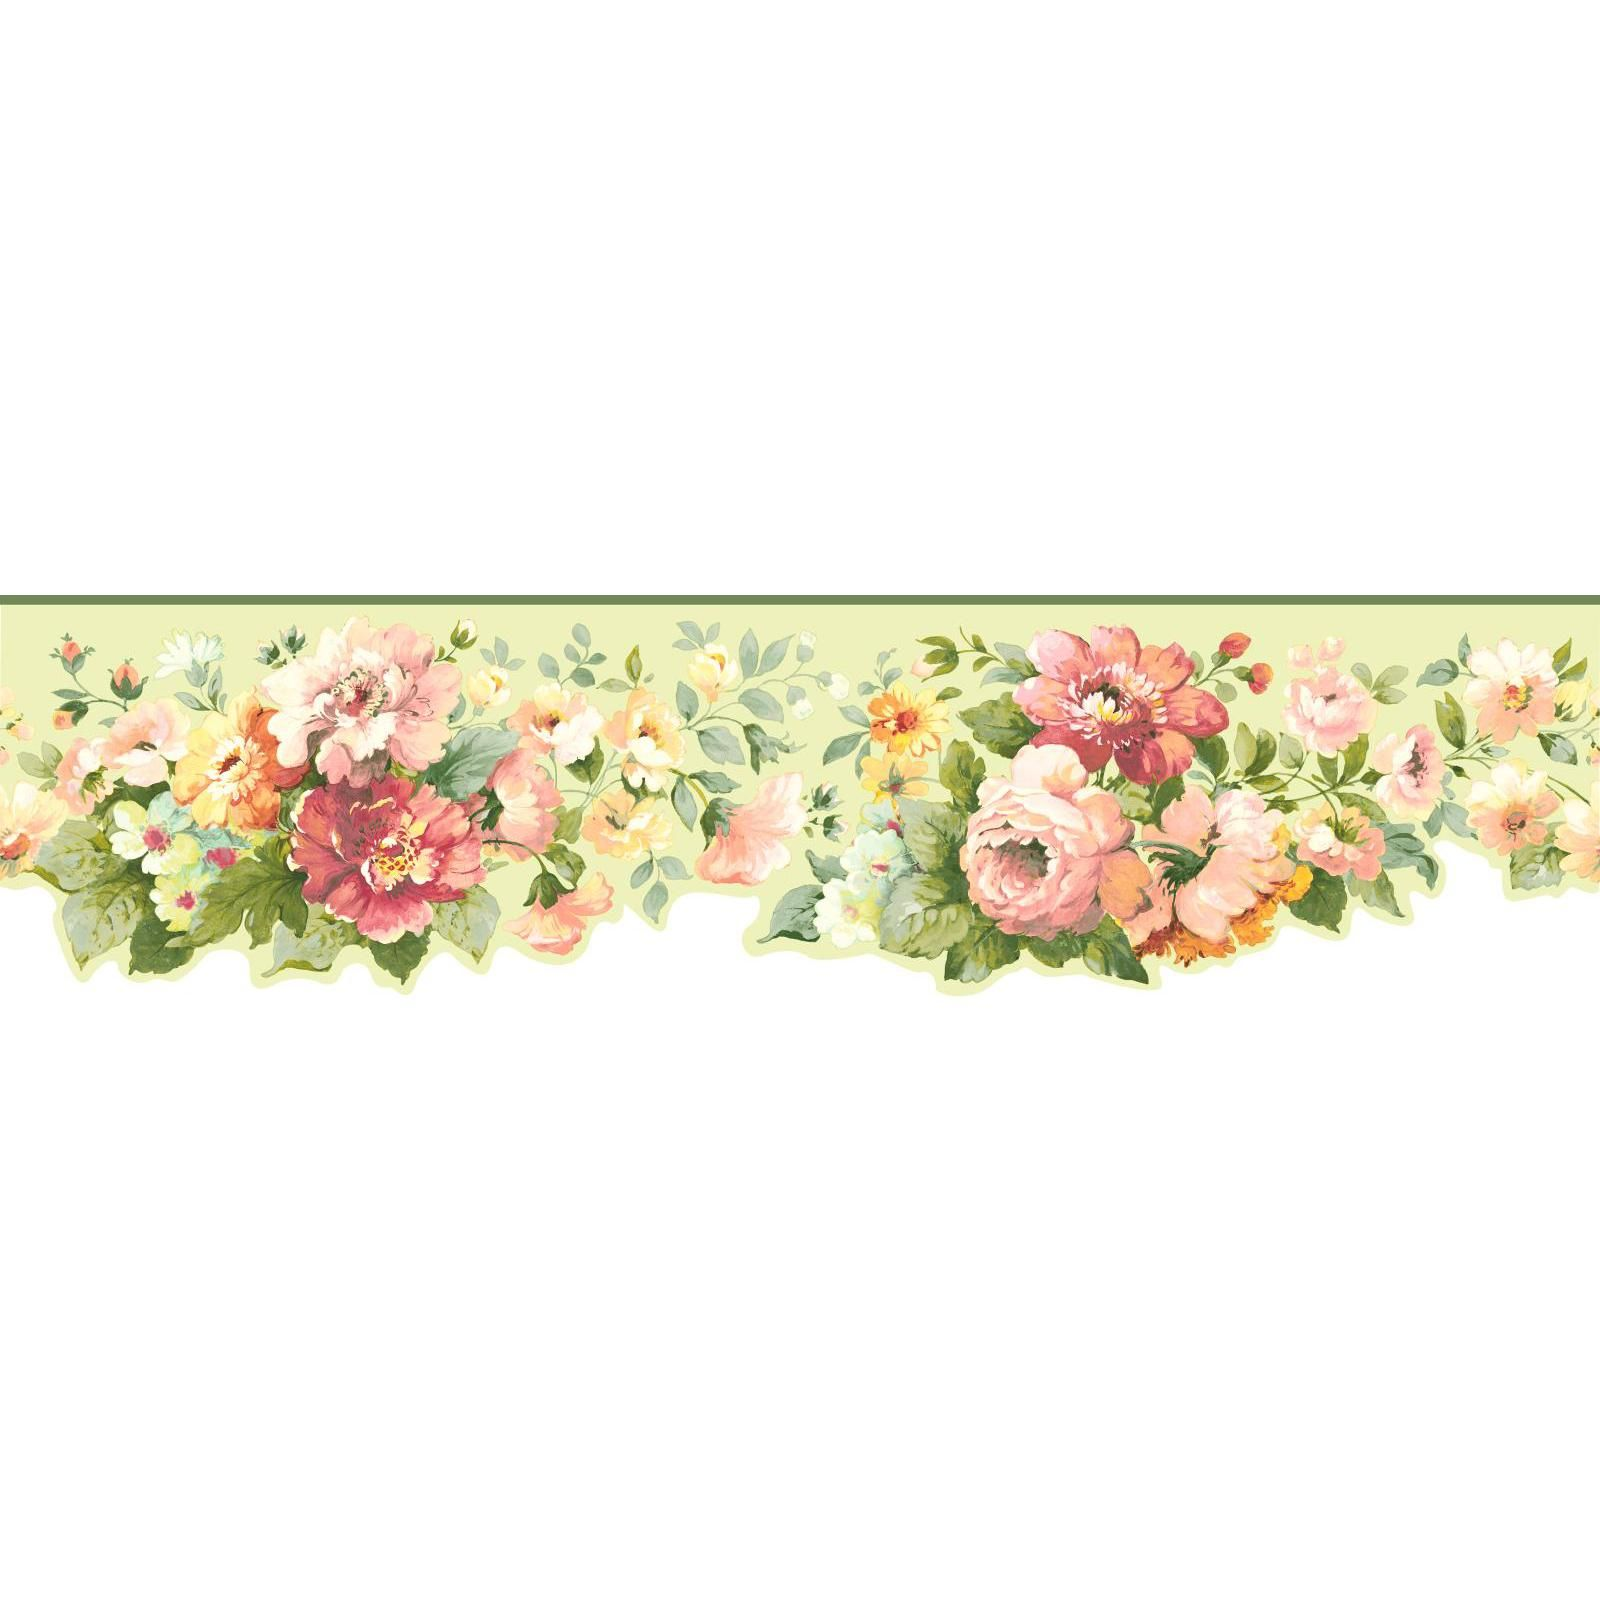 York Wallcoverings Border Document Floral Border in Mint